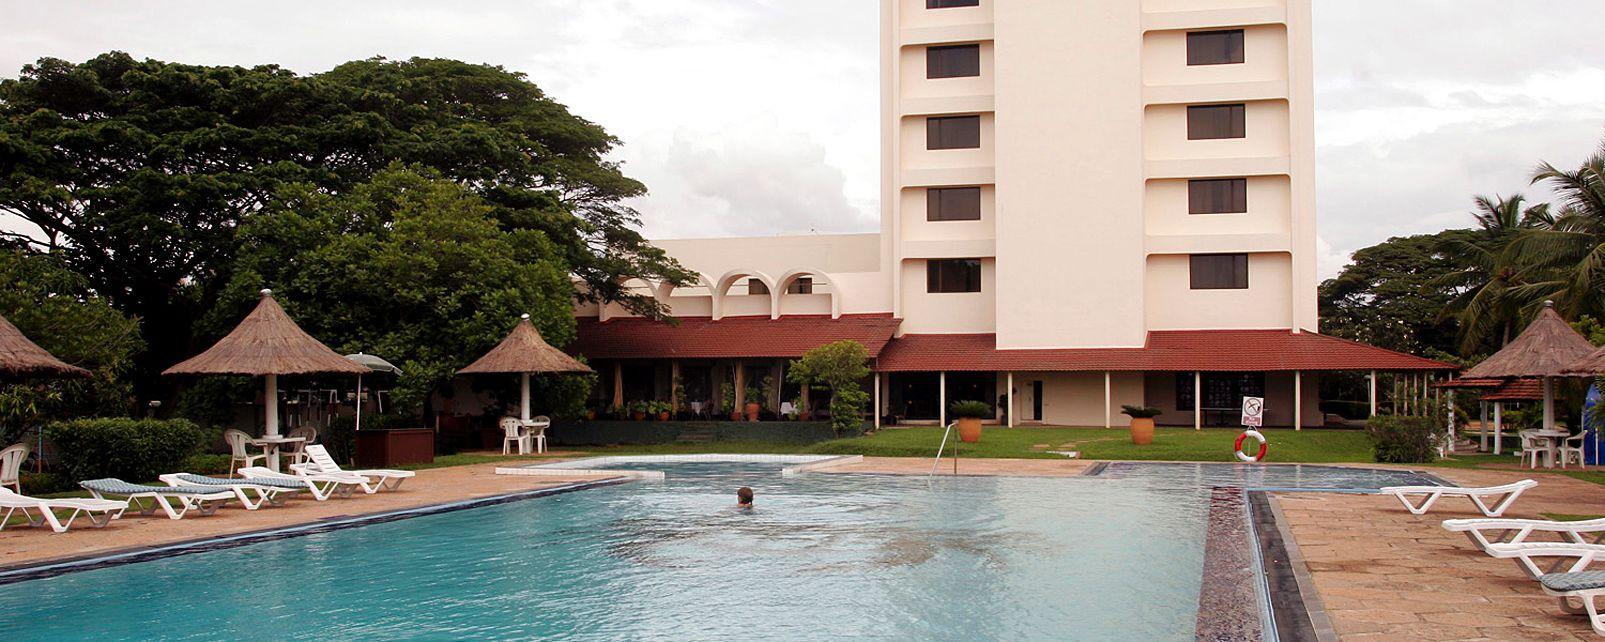 Hotel Taj Airport Garden